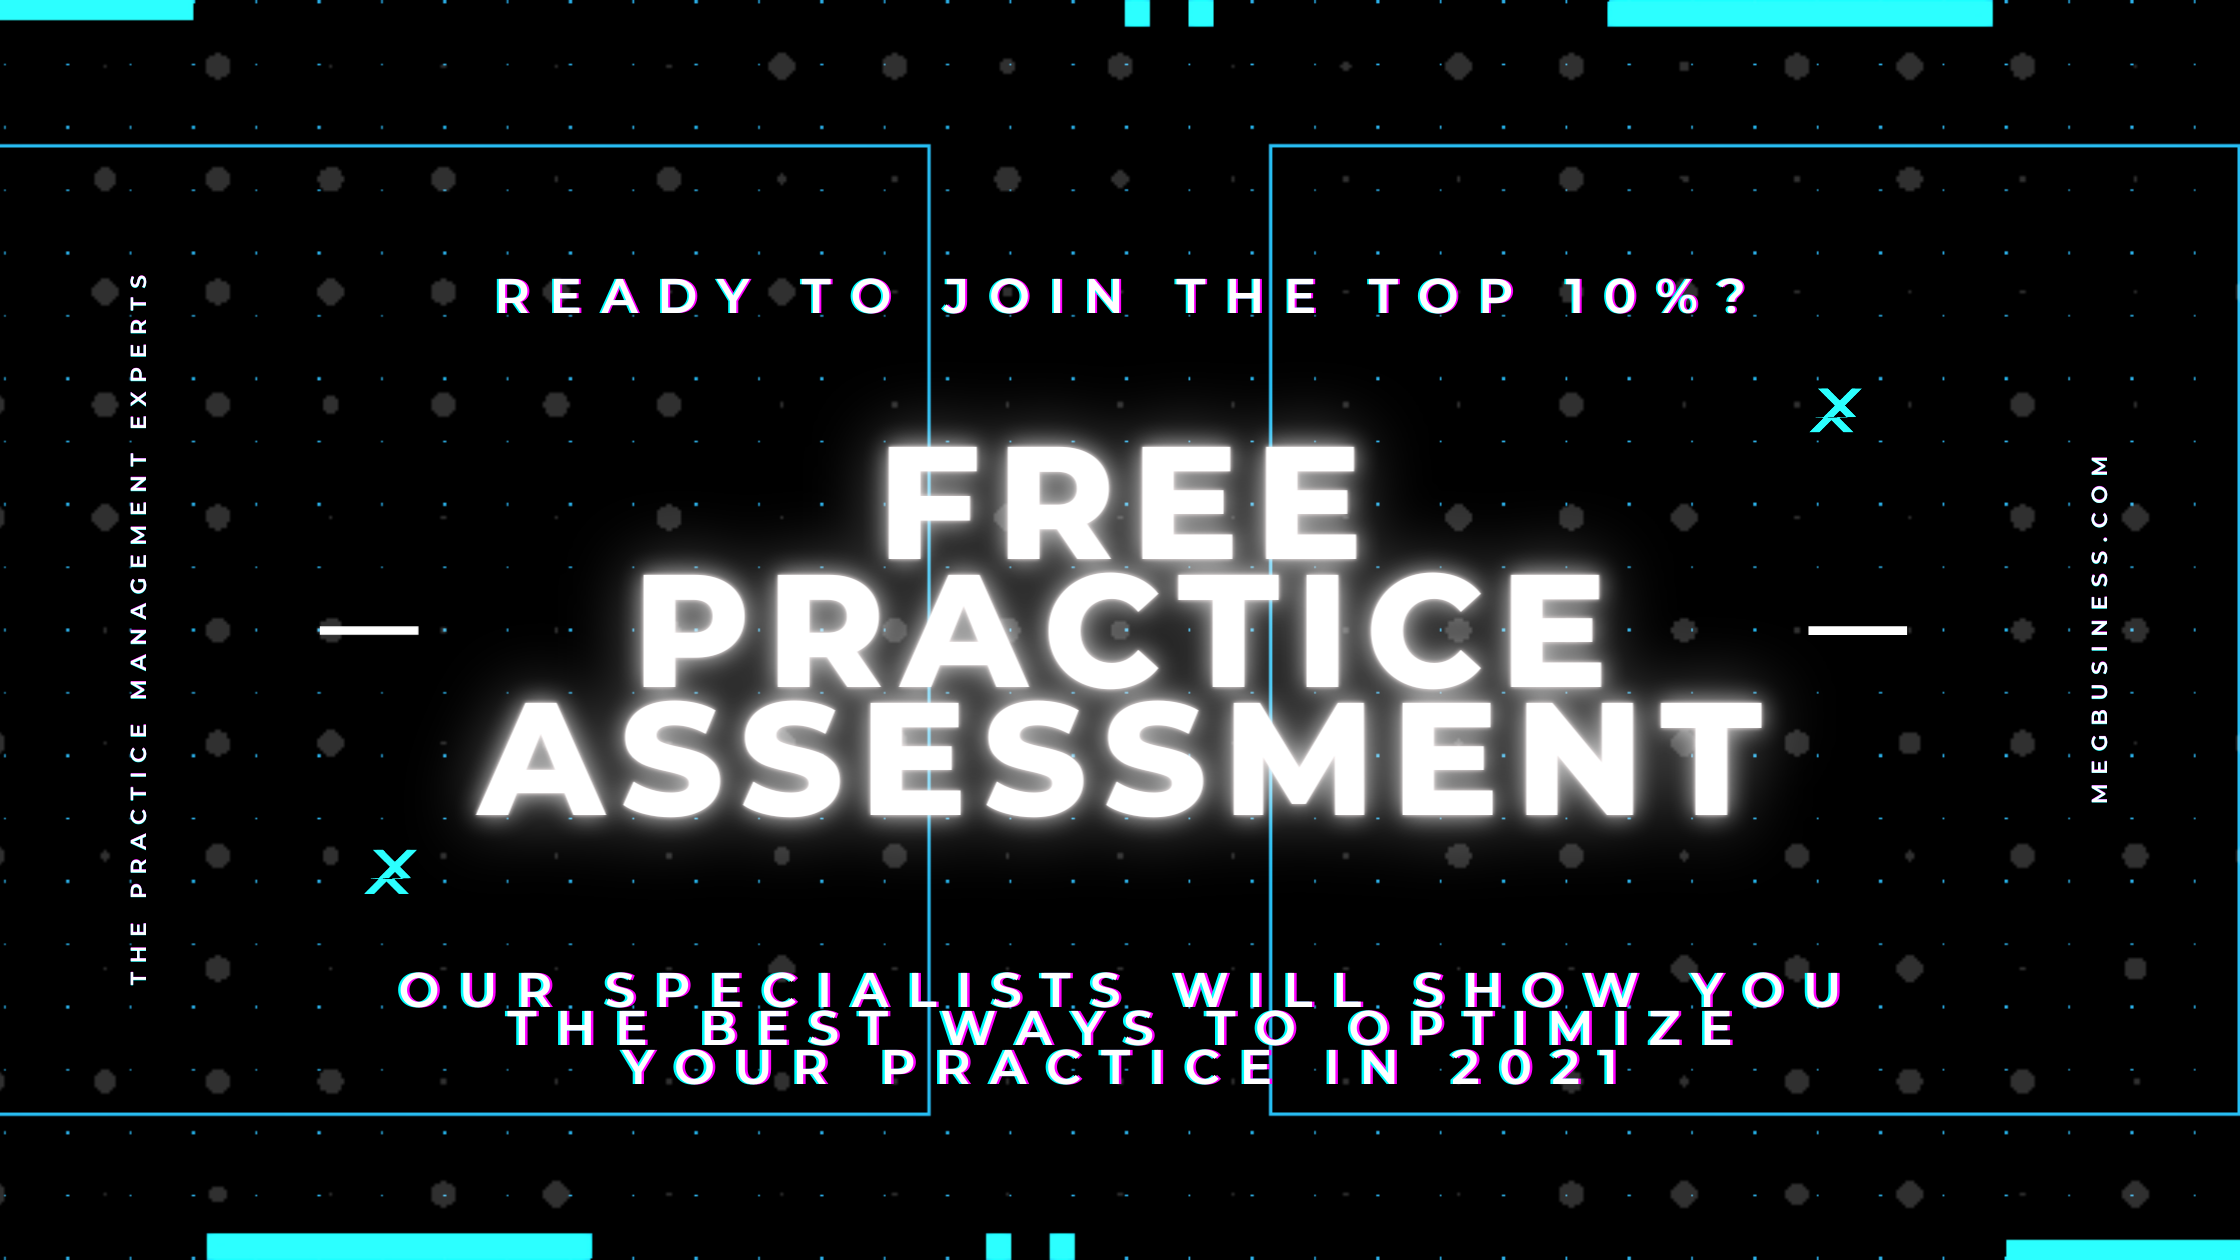 Practice Assessment CTA